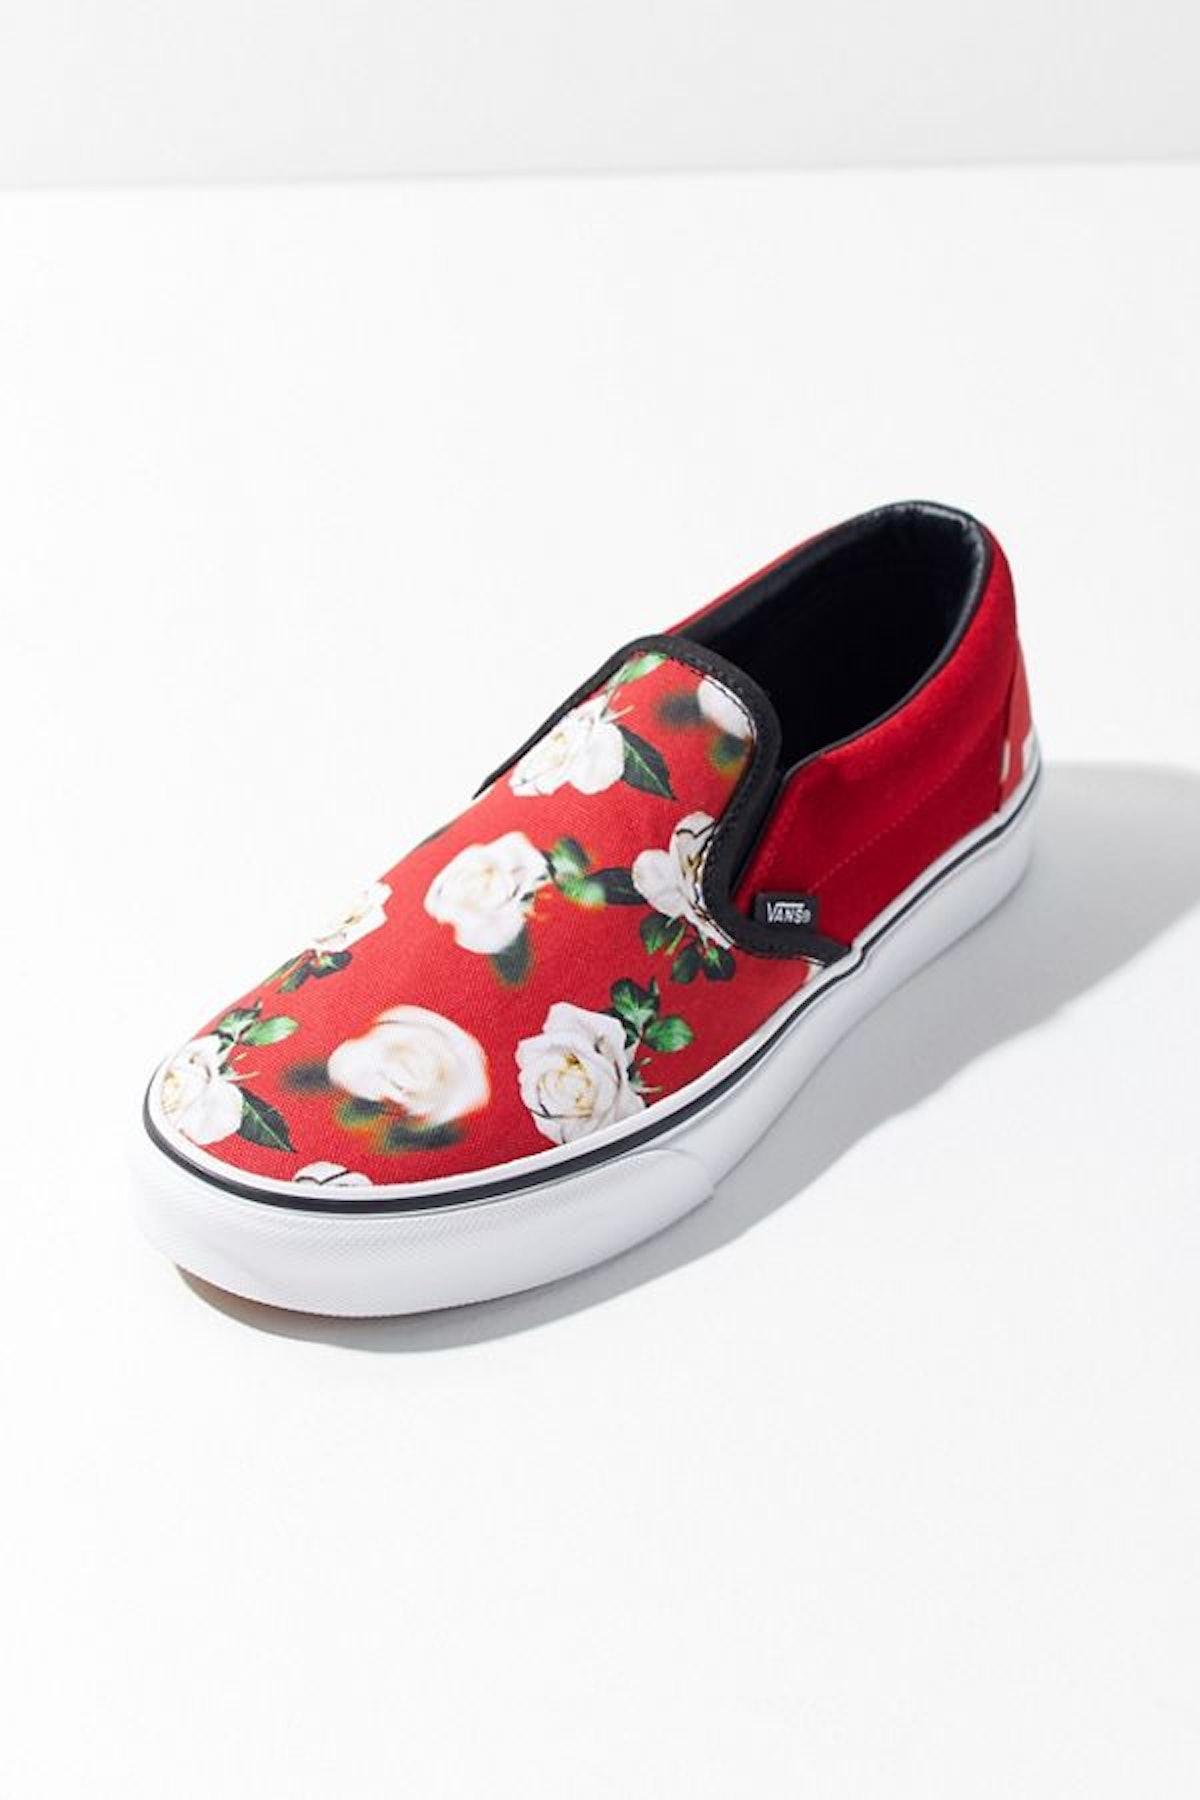 Vans Blurred Floral Slip-On Sneaker